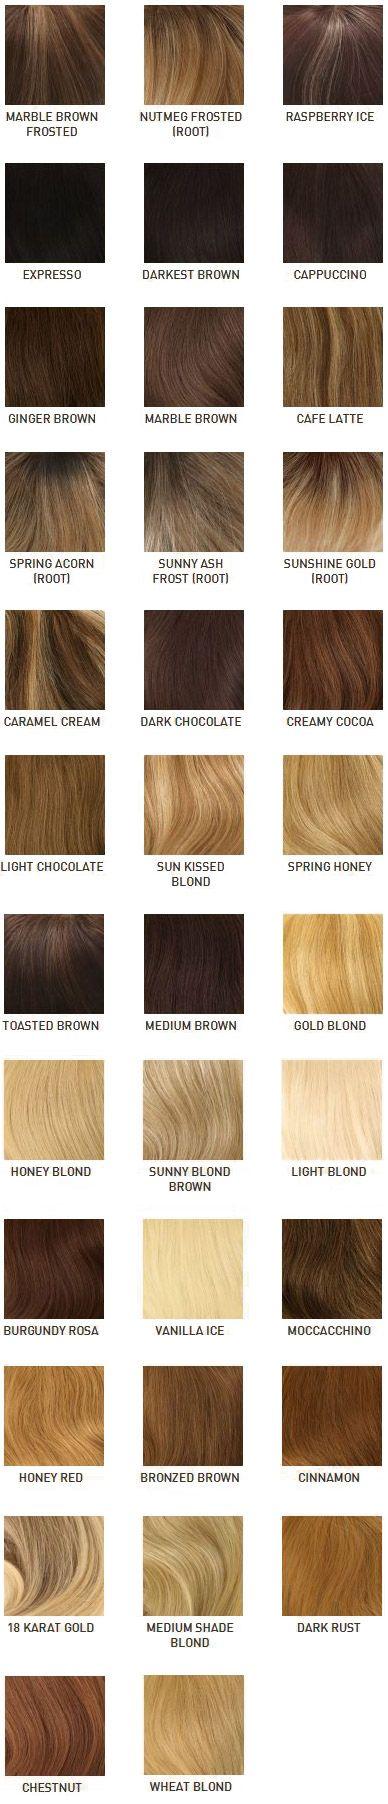 Human Hair Color Inheritance Chart Google Search Genetics